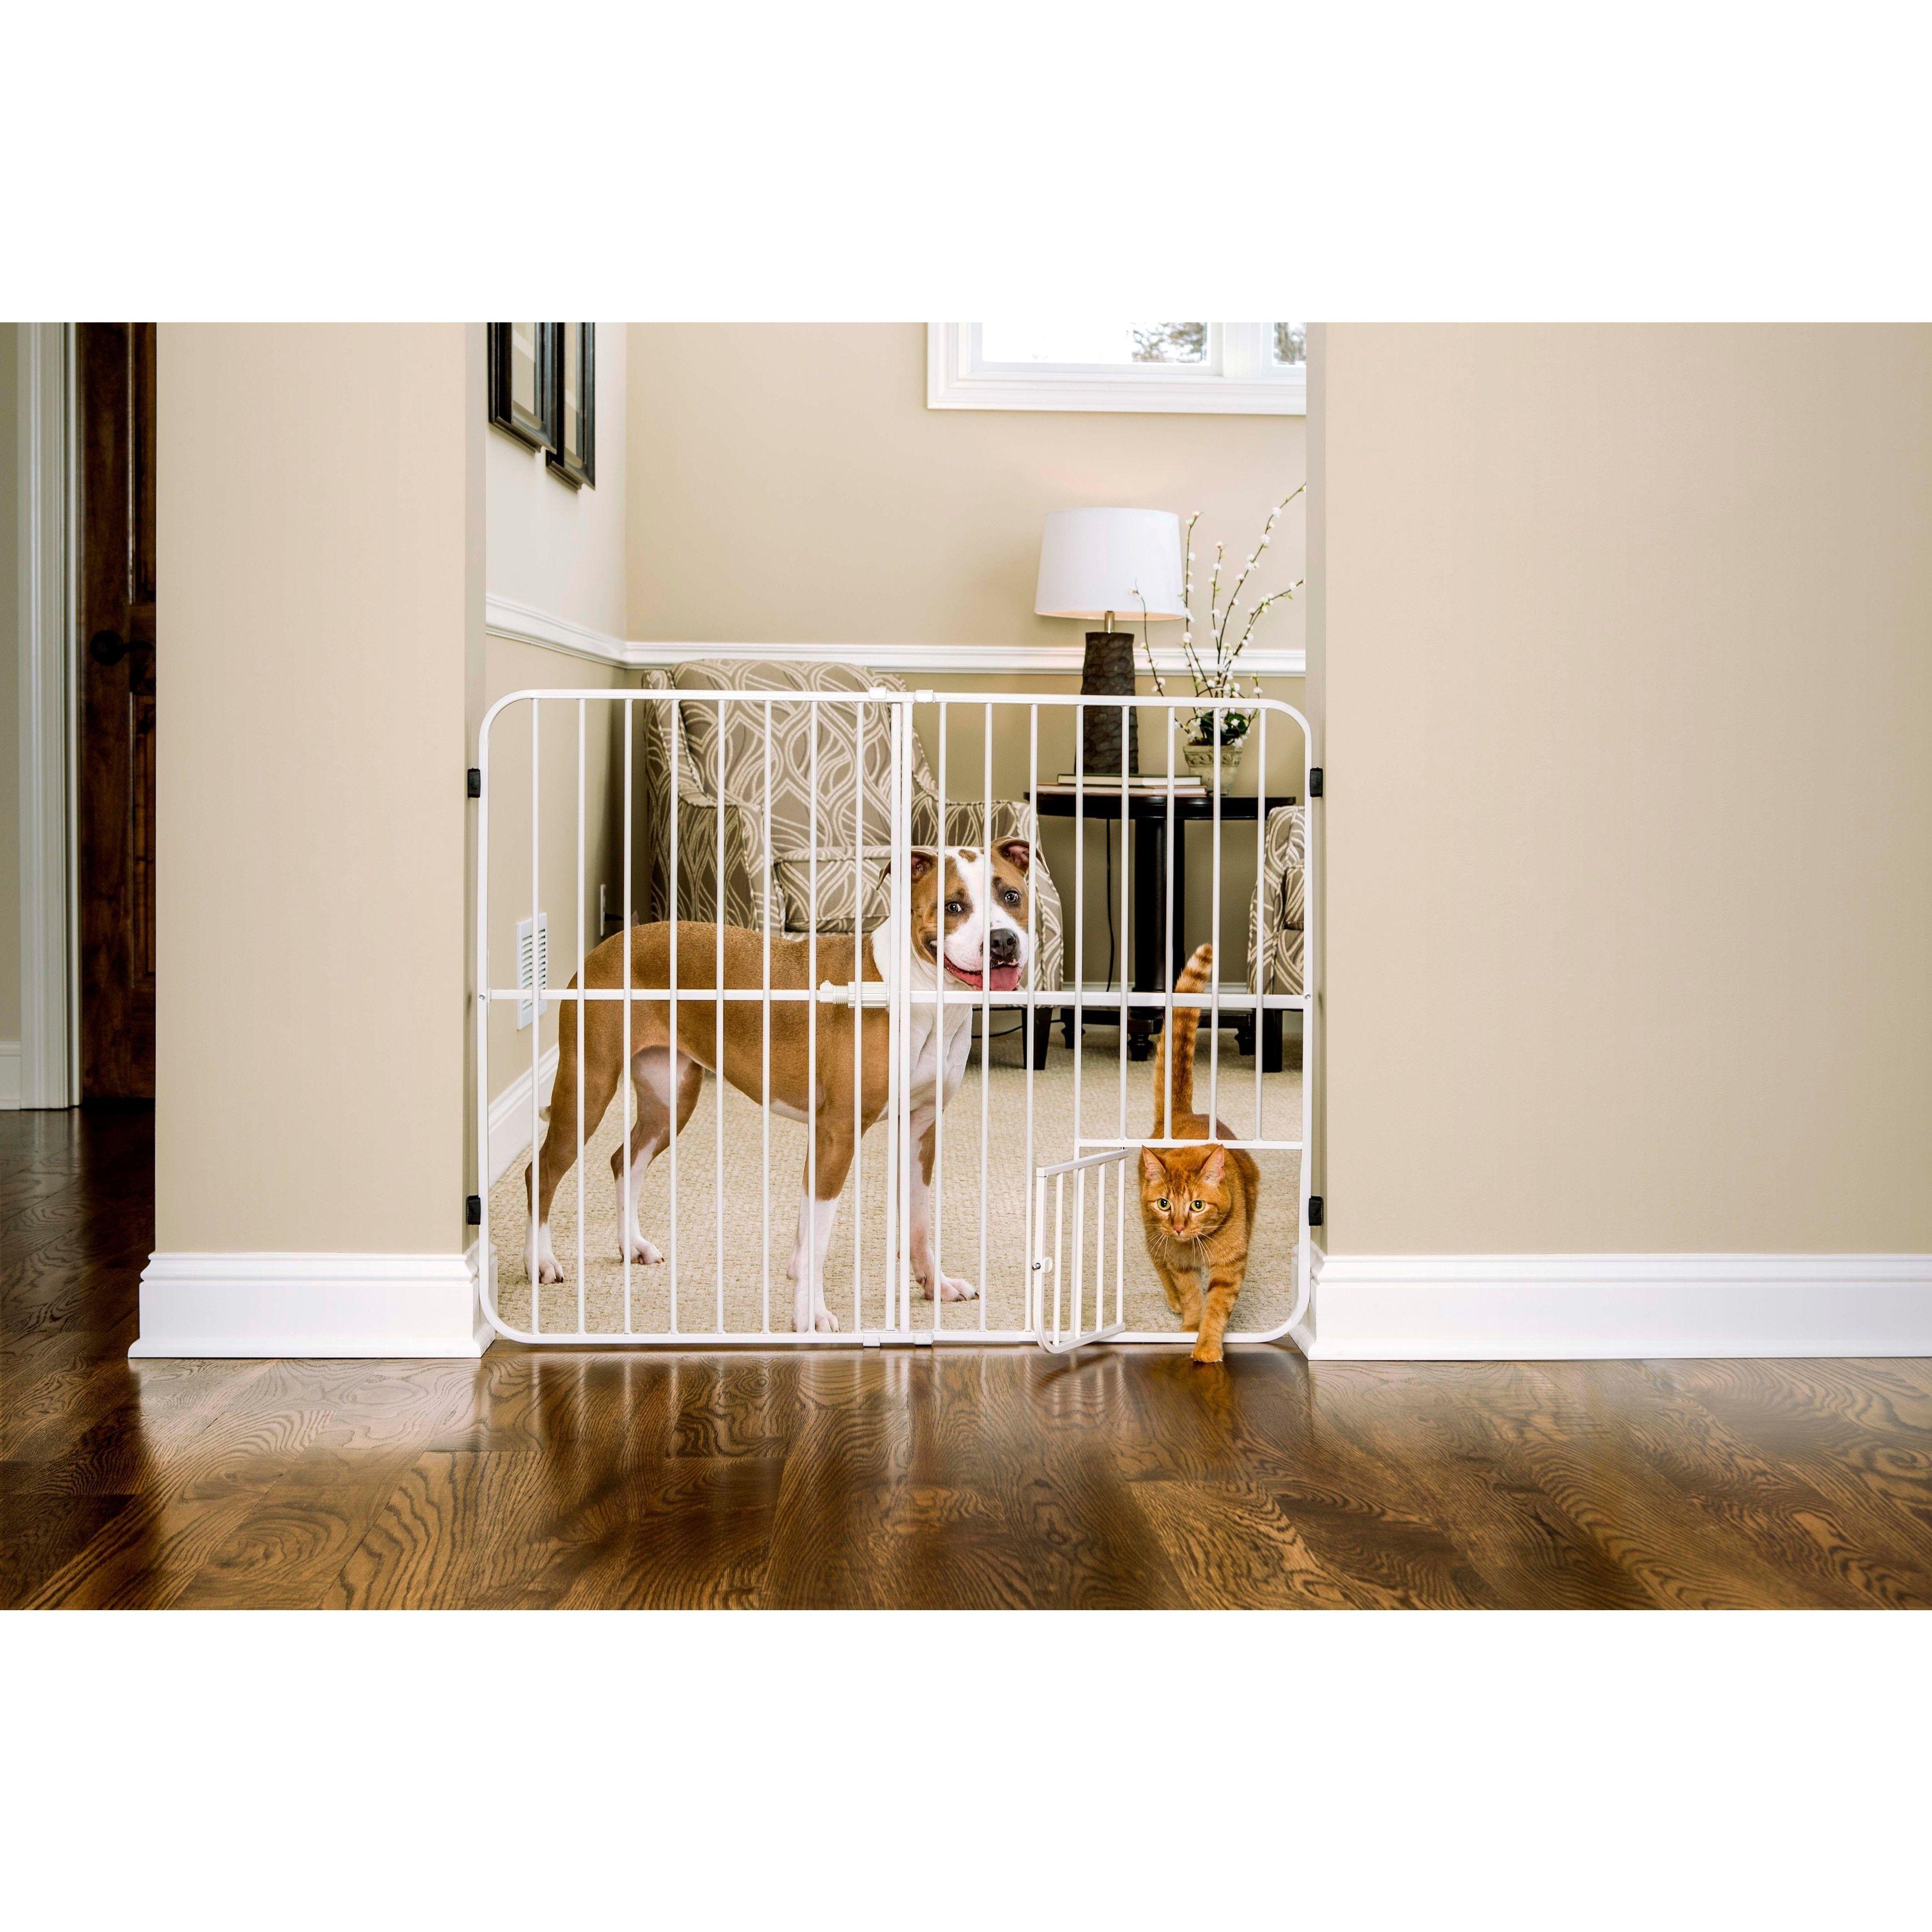 Carlson extra tall tuffy metal expandable pet gate